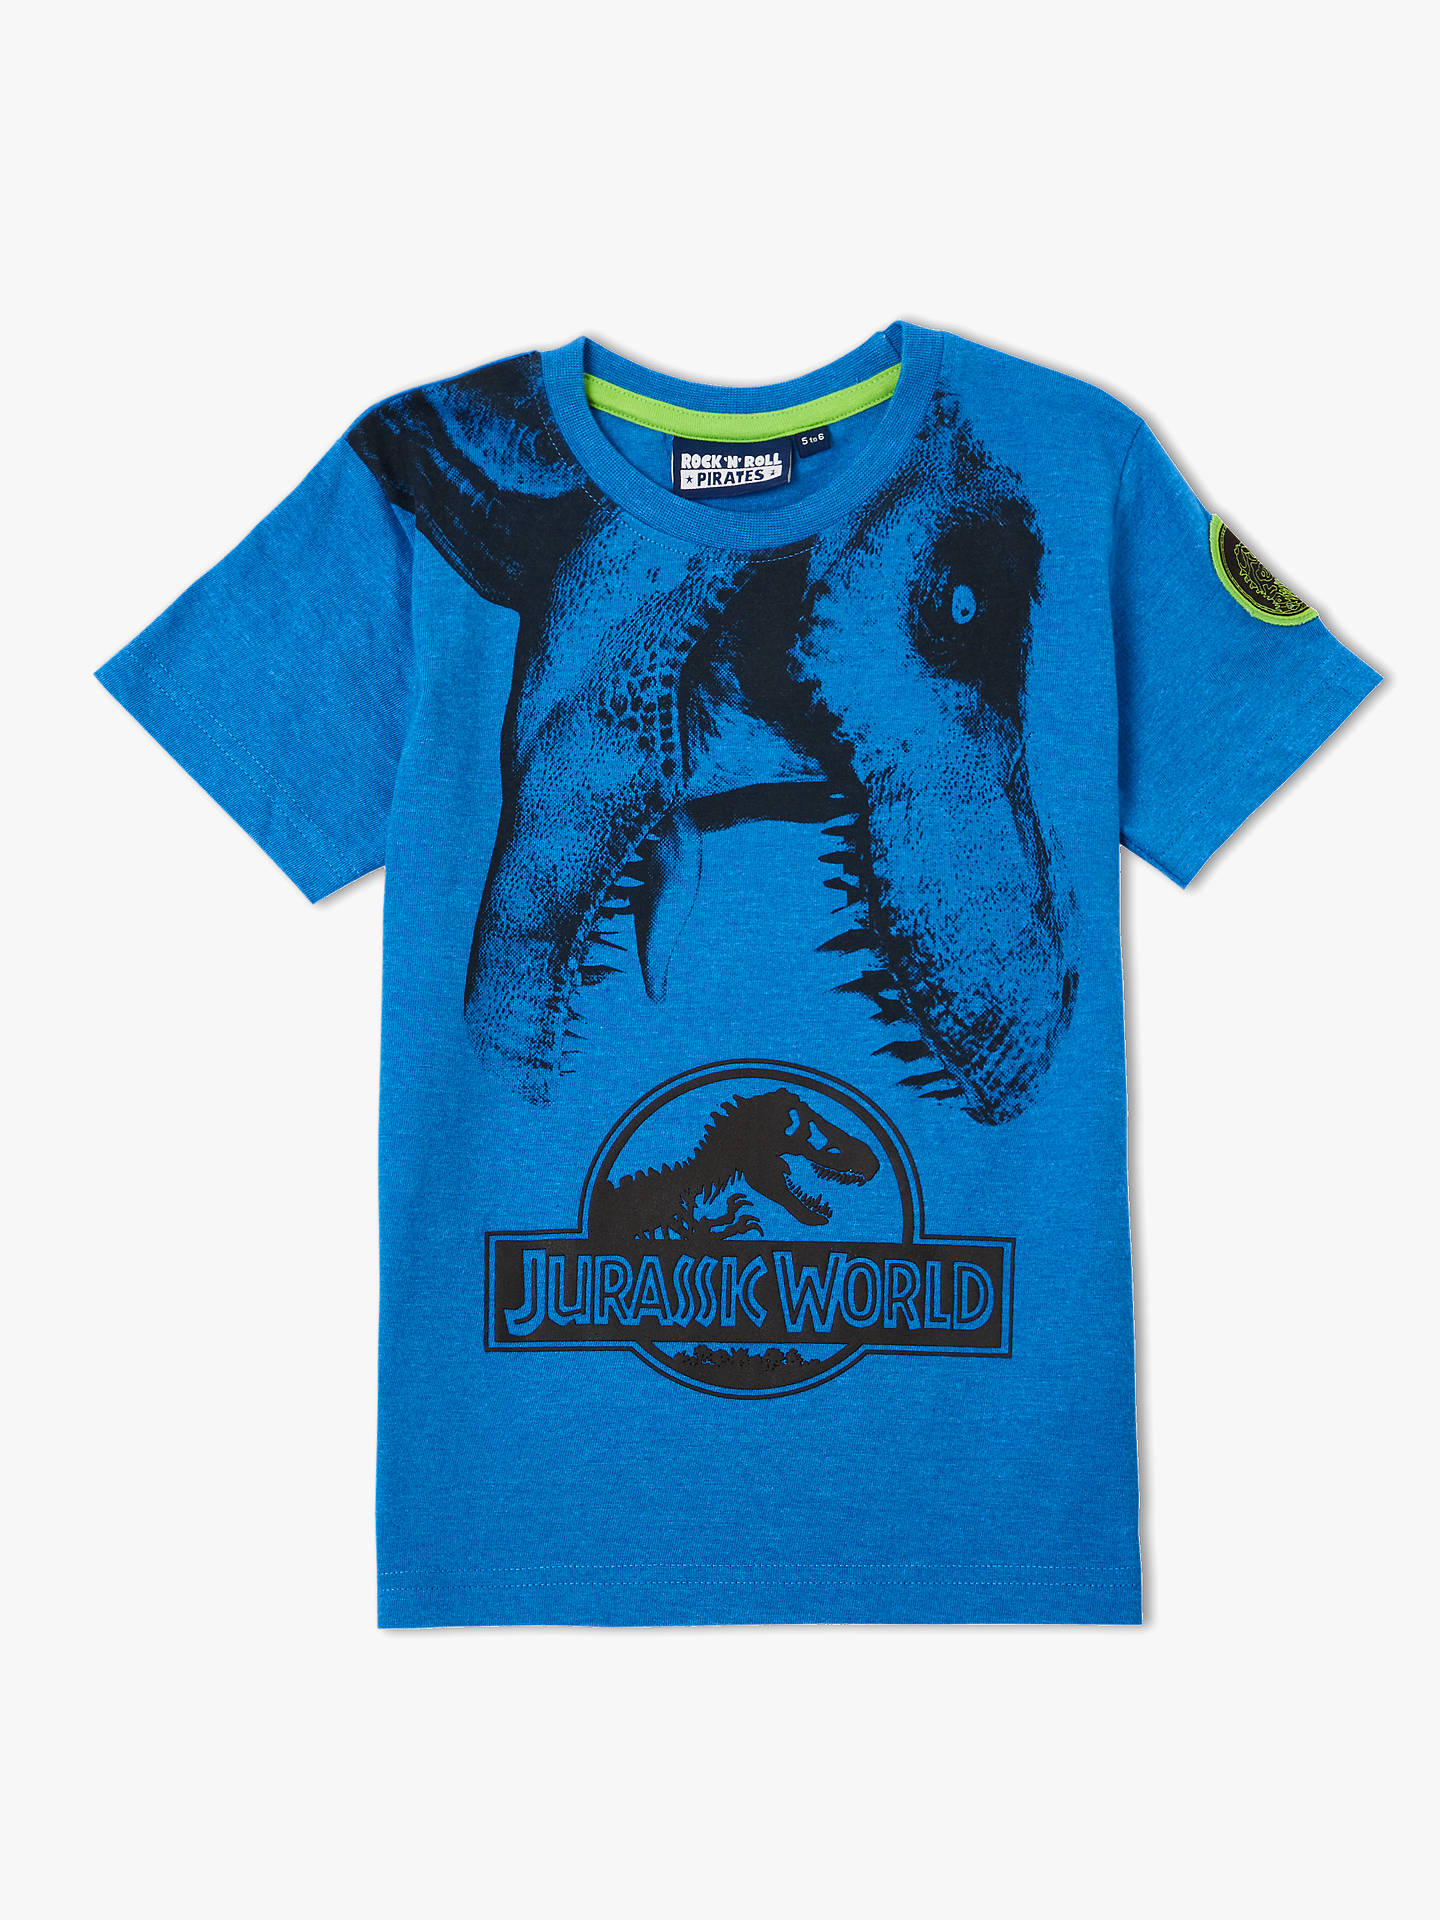 226ebb46 Jurassic World Boys' T-Rex T-Shirt, Blue at John Lewis & Partners